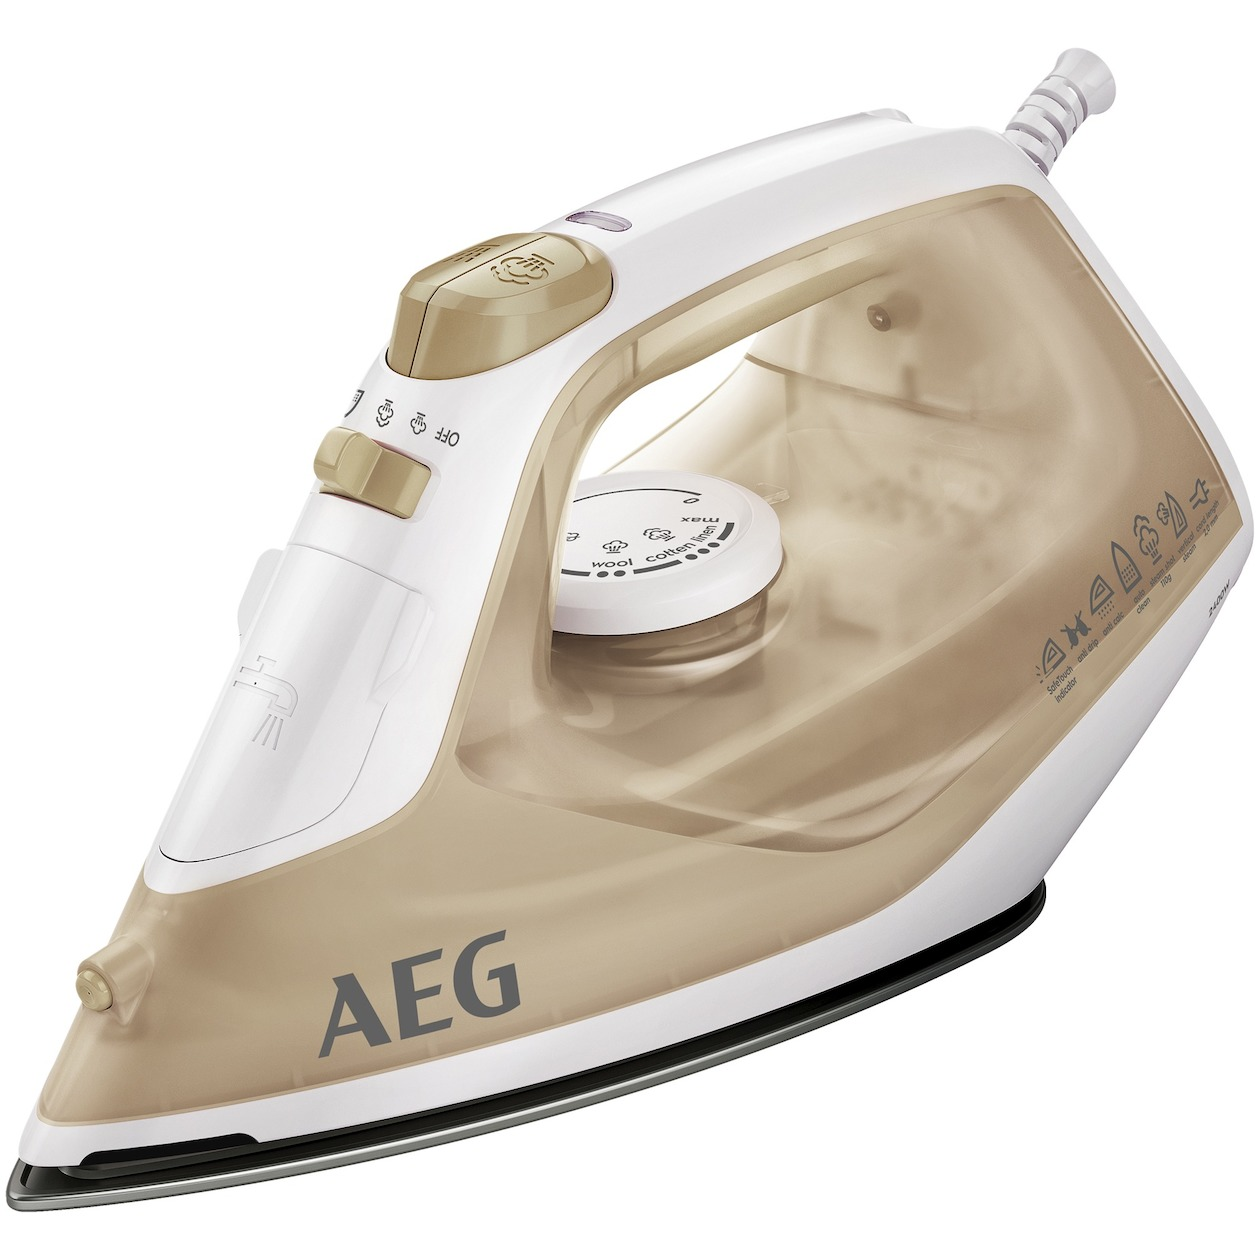 AEG strijkijzer DB1740 amber